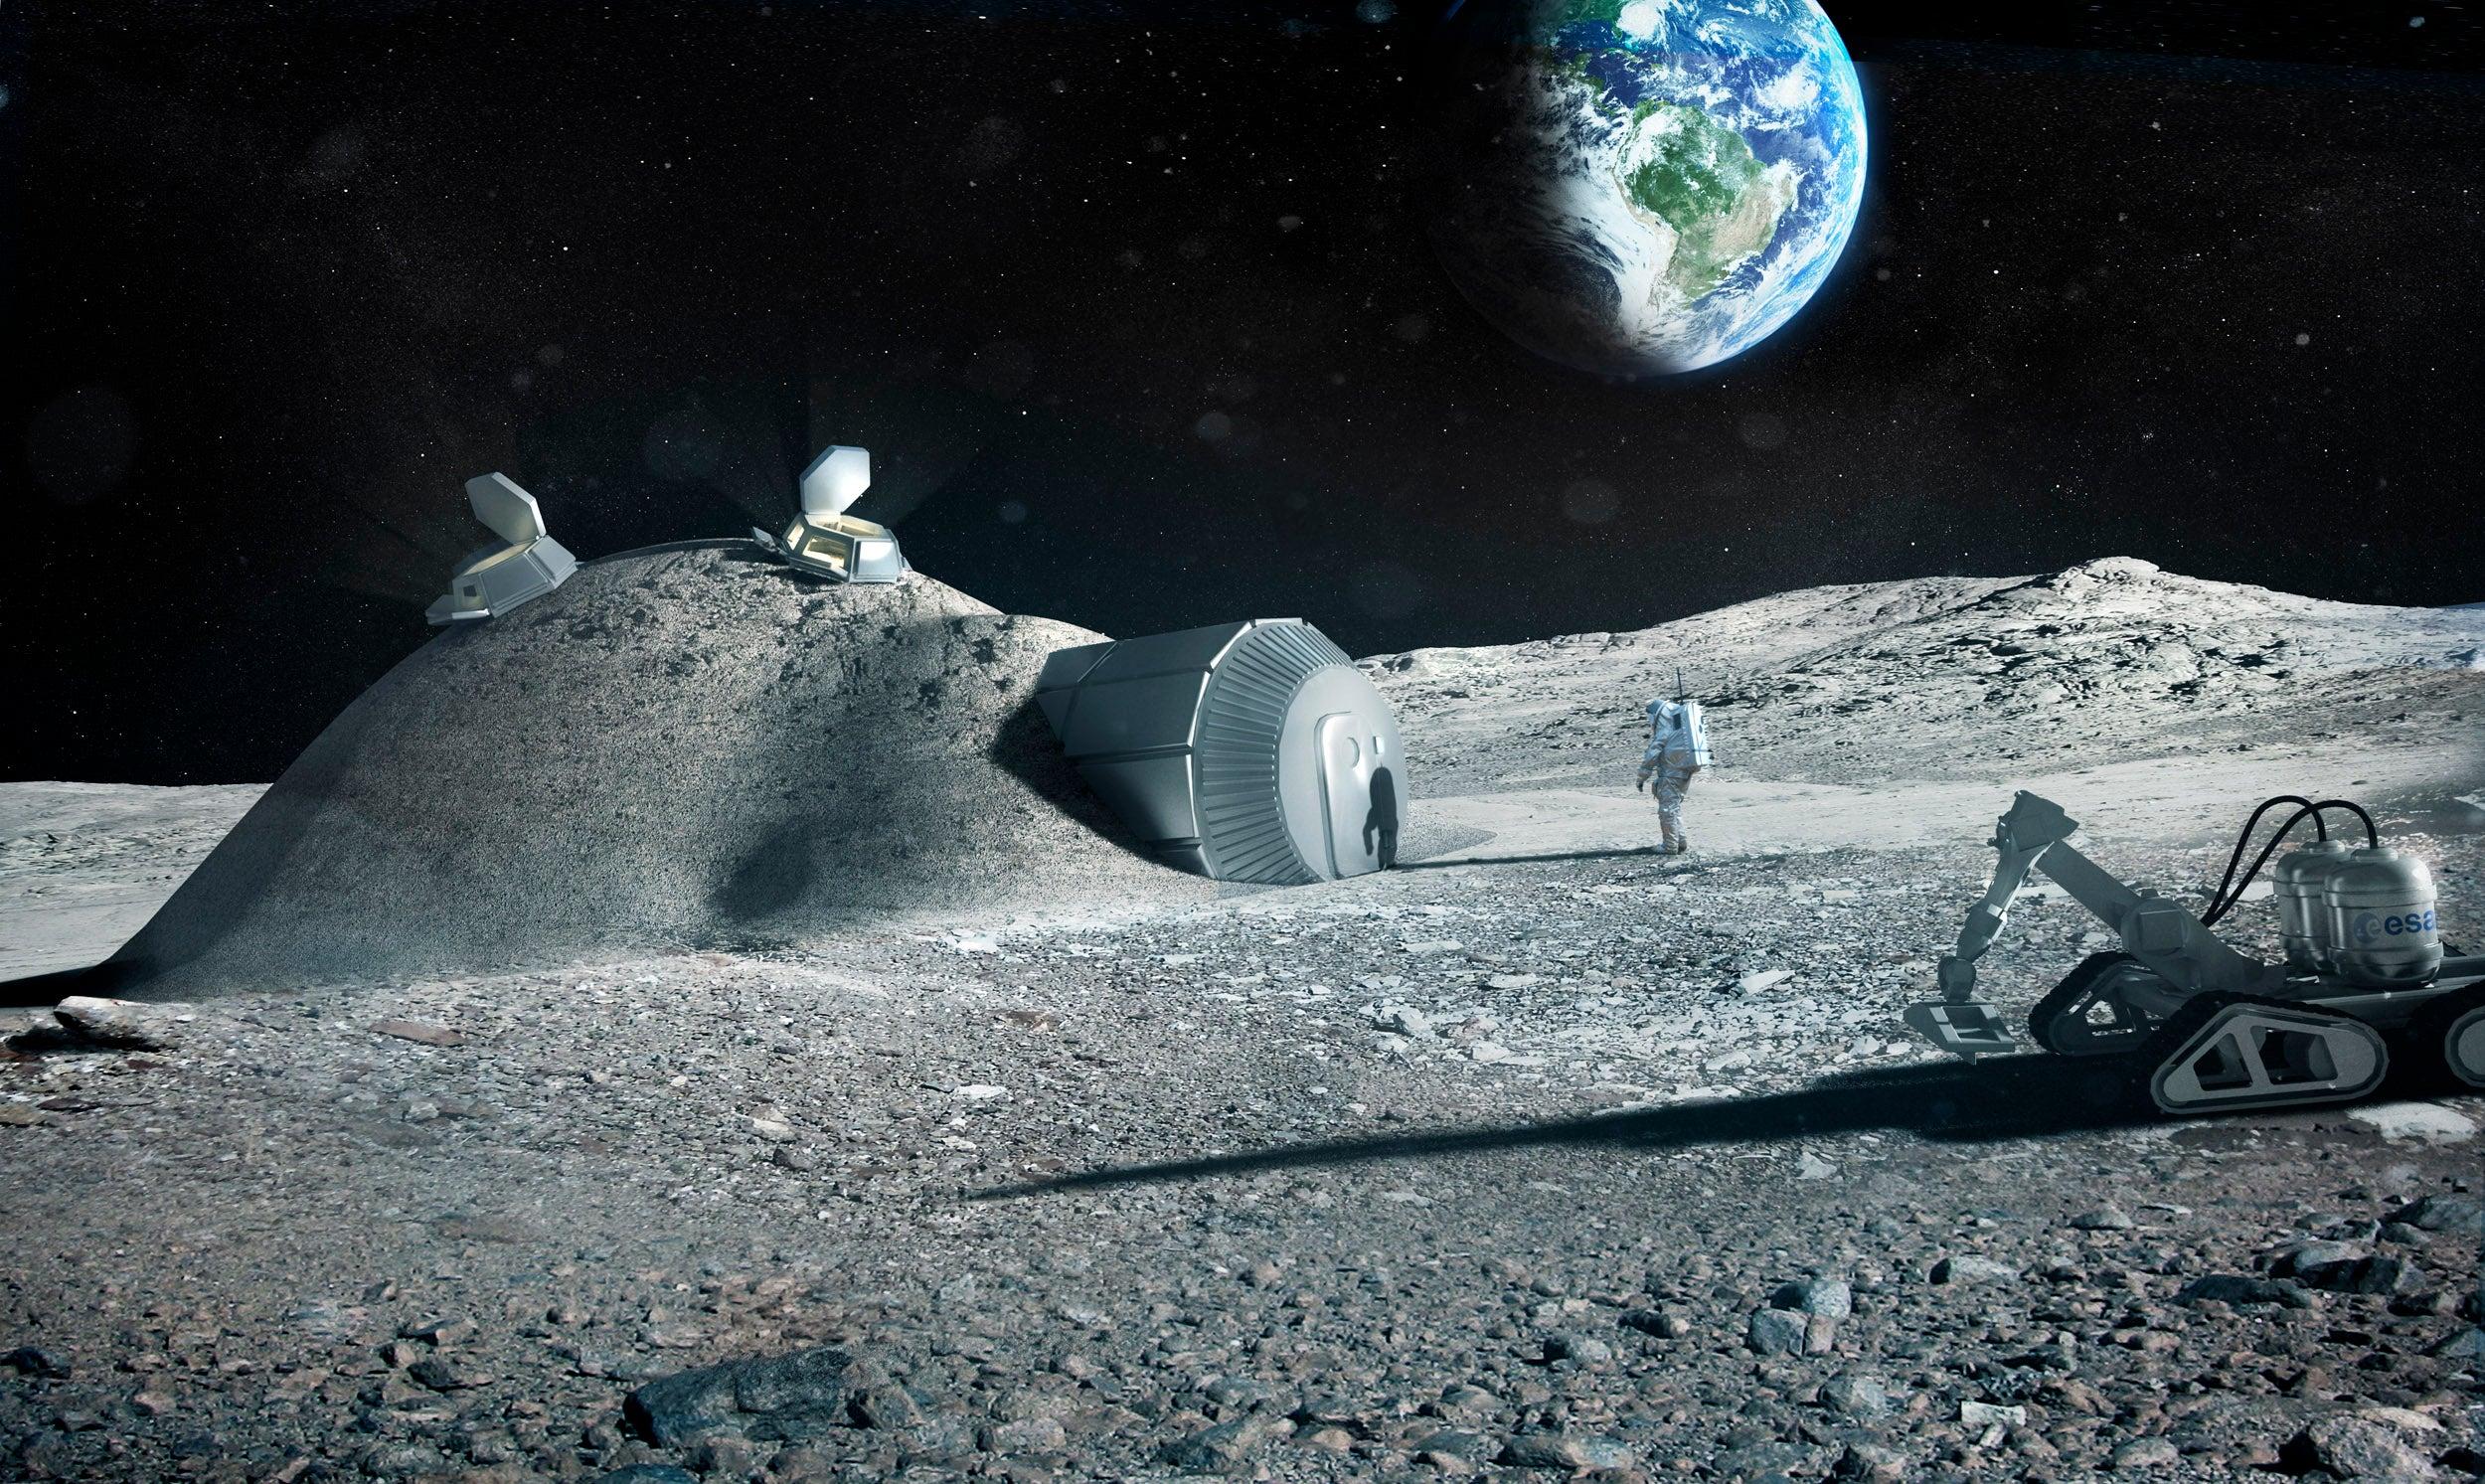 ESA impression of a Lunar base made with 3D printing pillars